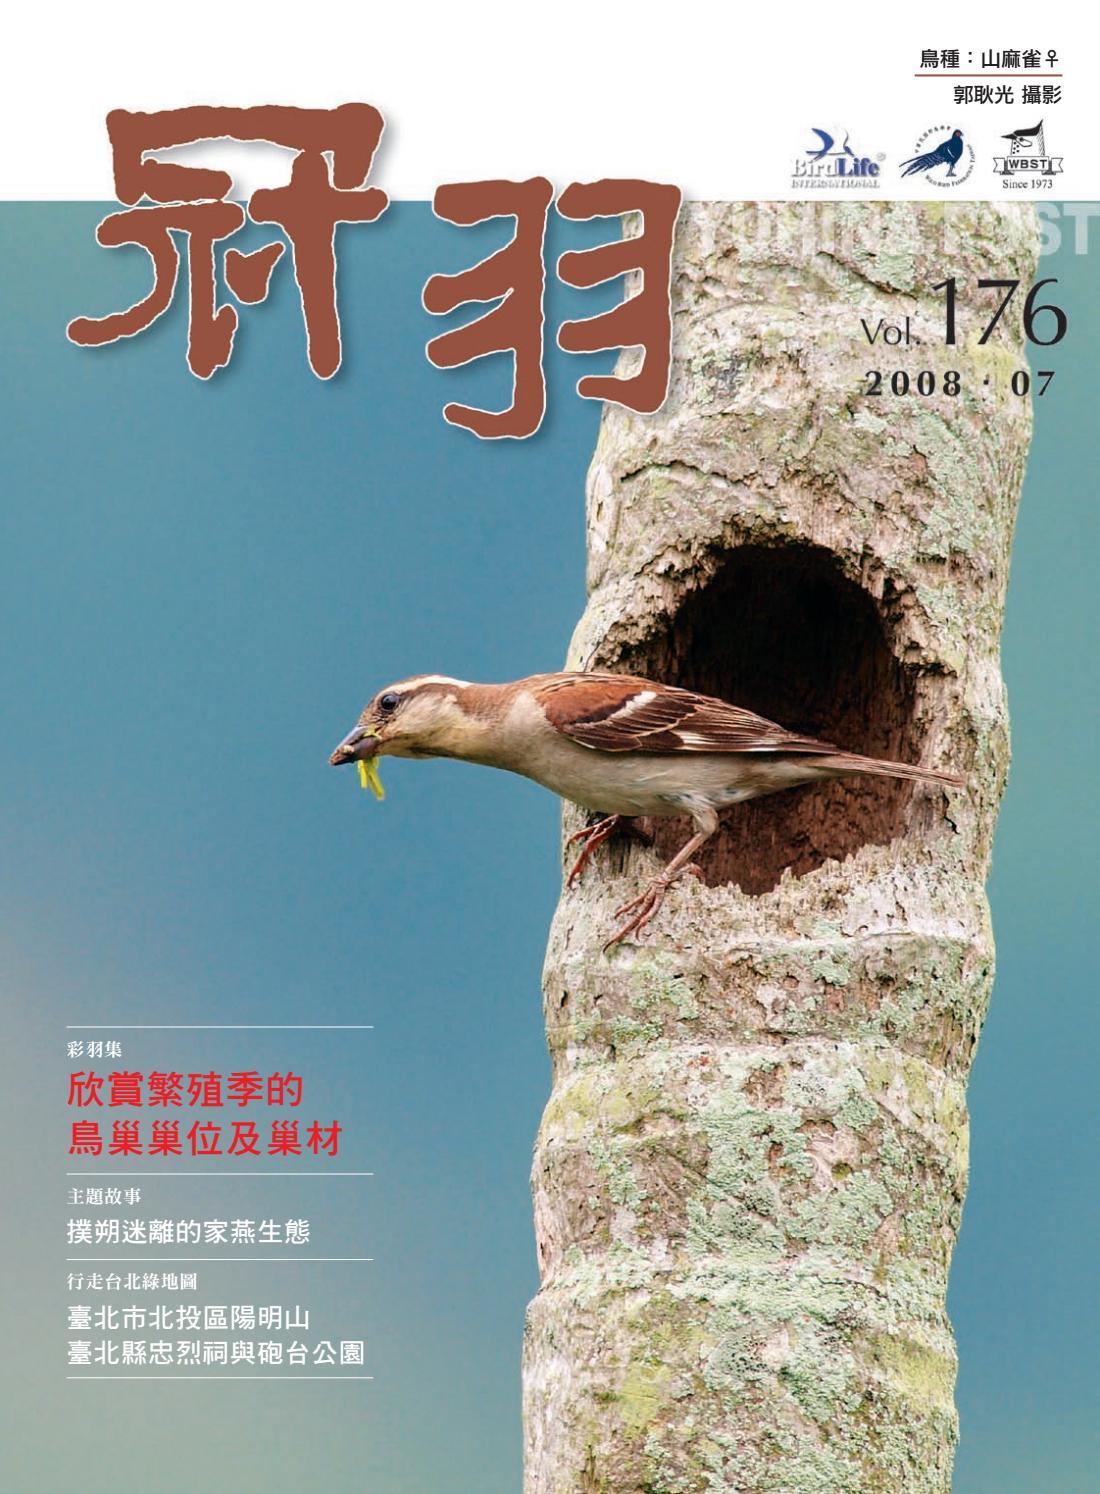 冠羽176期 by Wild Bird Society of Taipei - Issuu